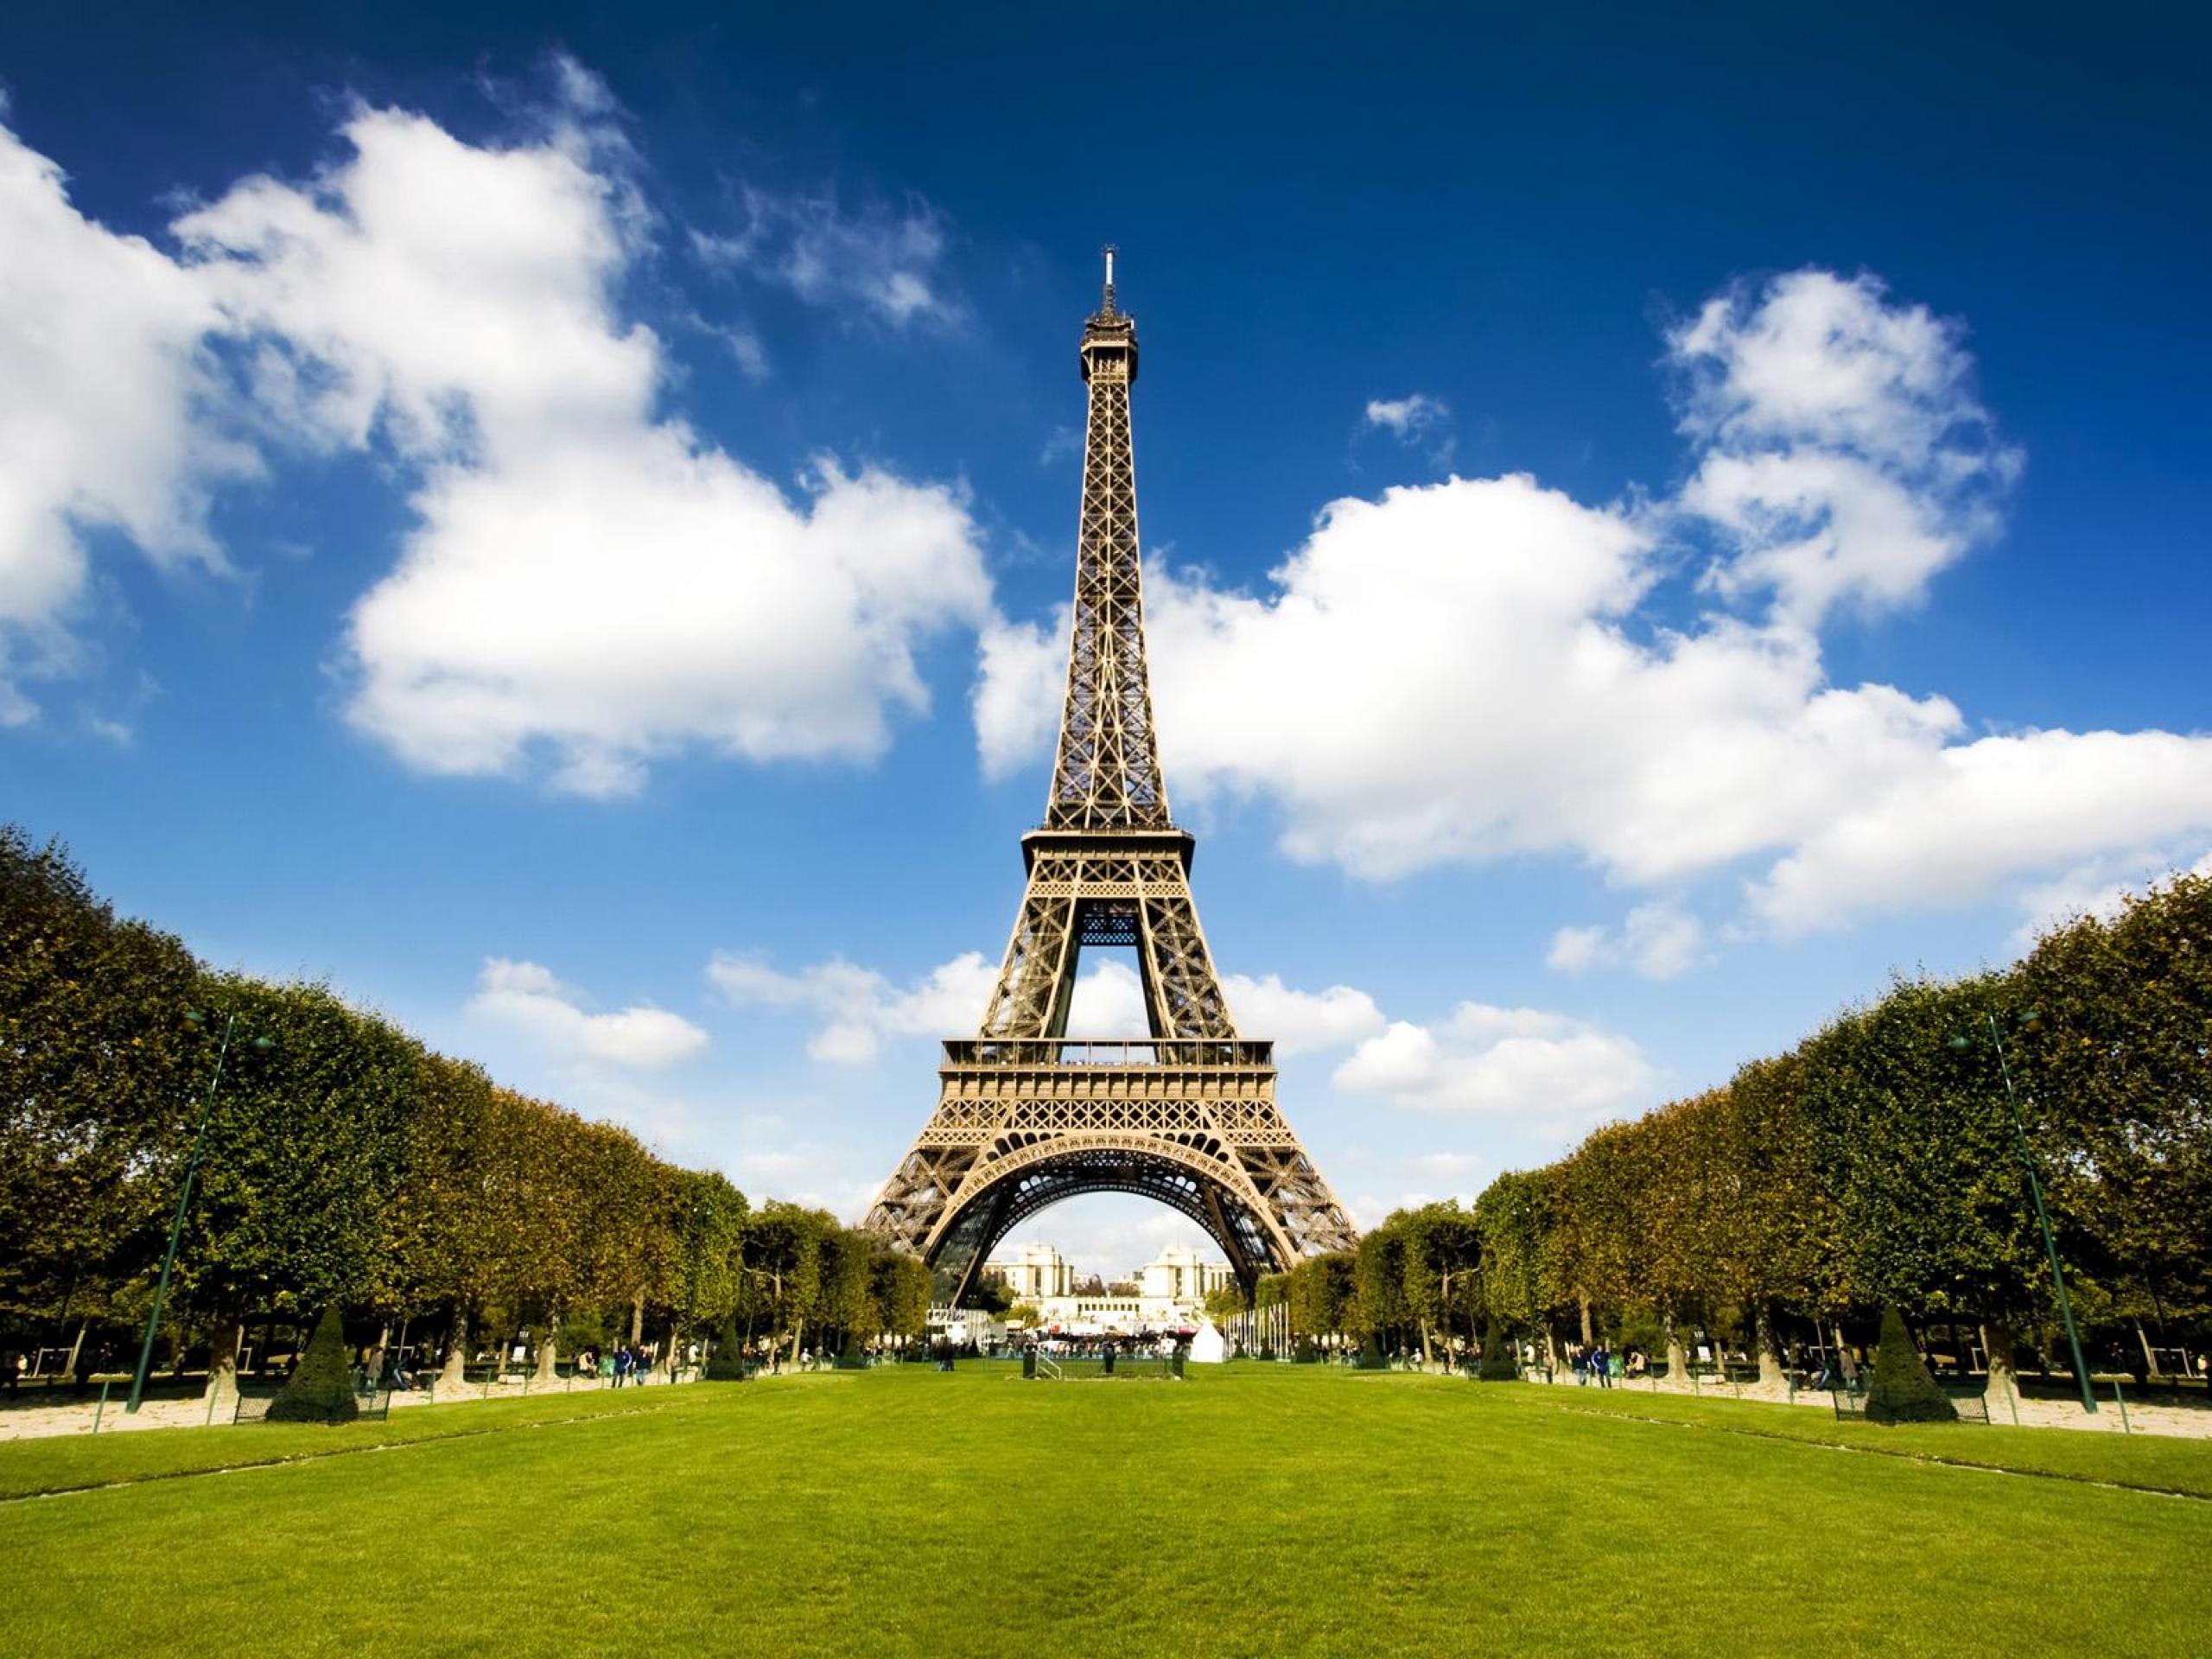 Eiffel Tower Paris France Paintings